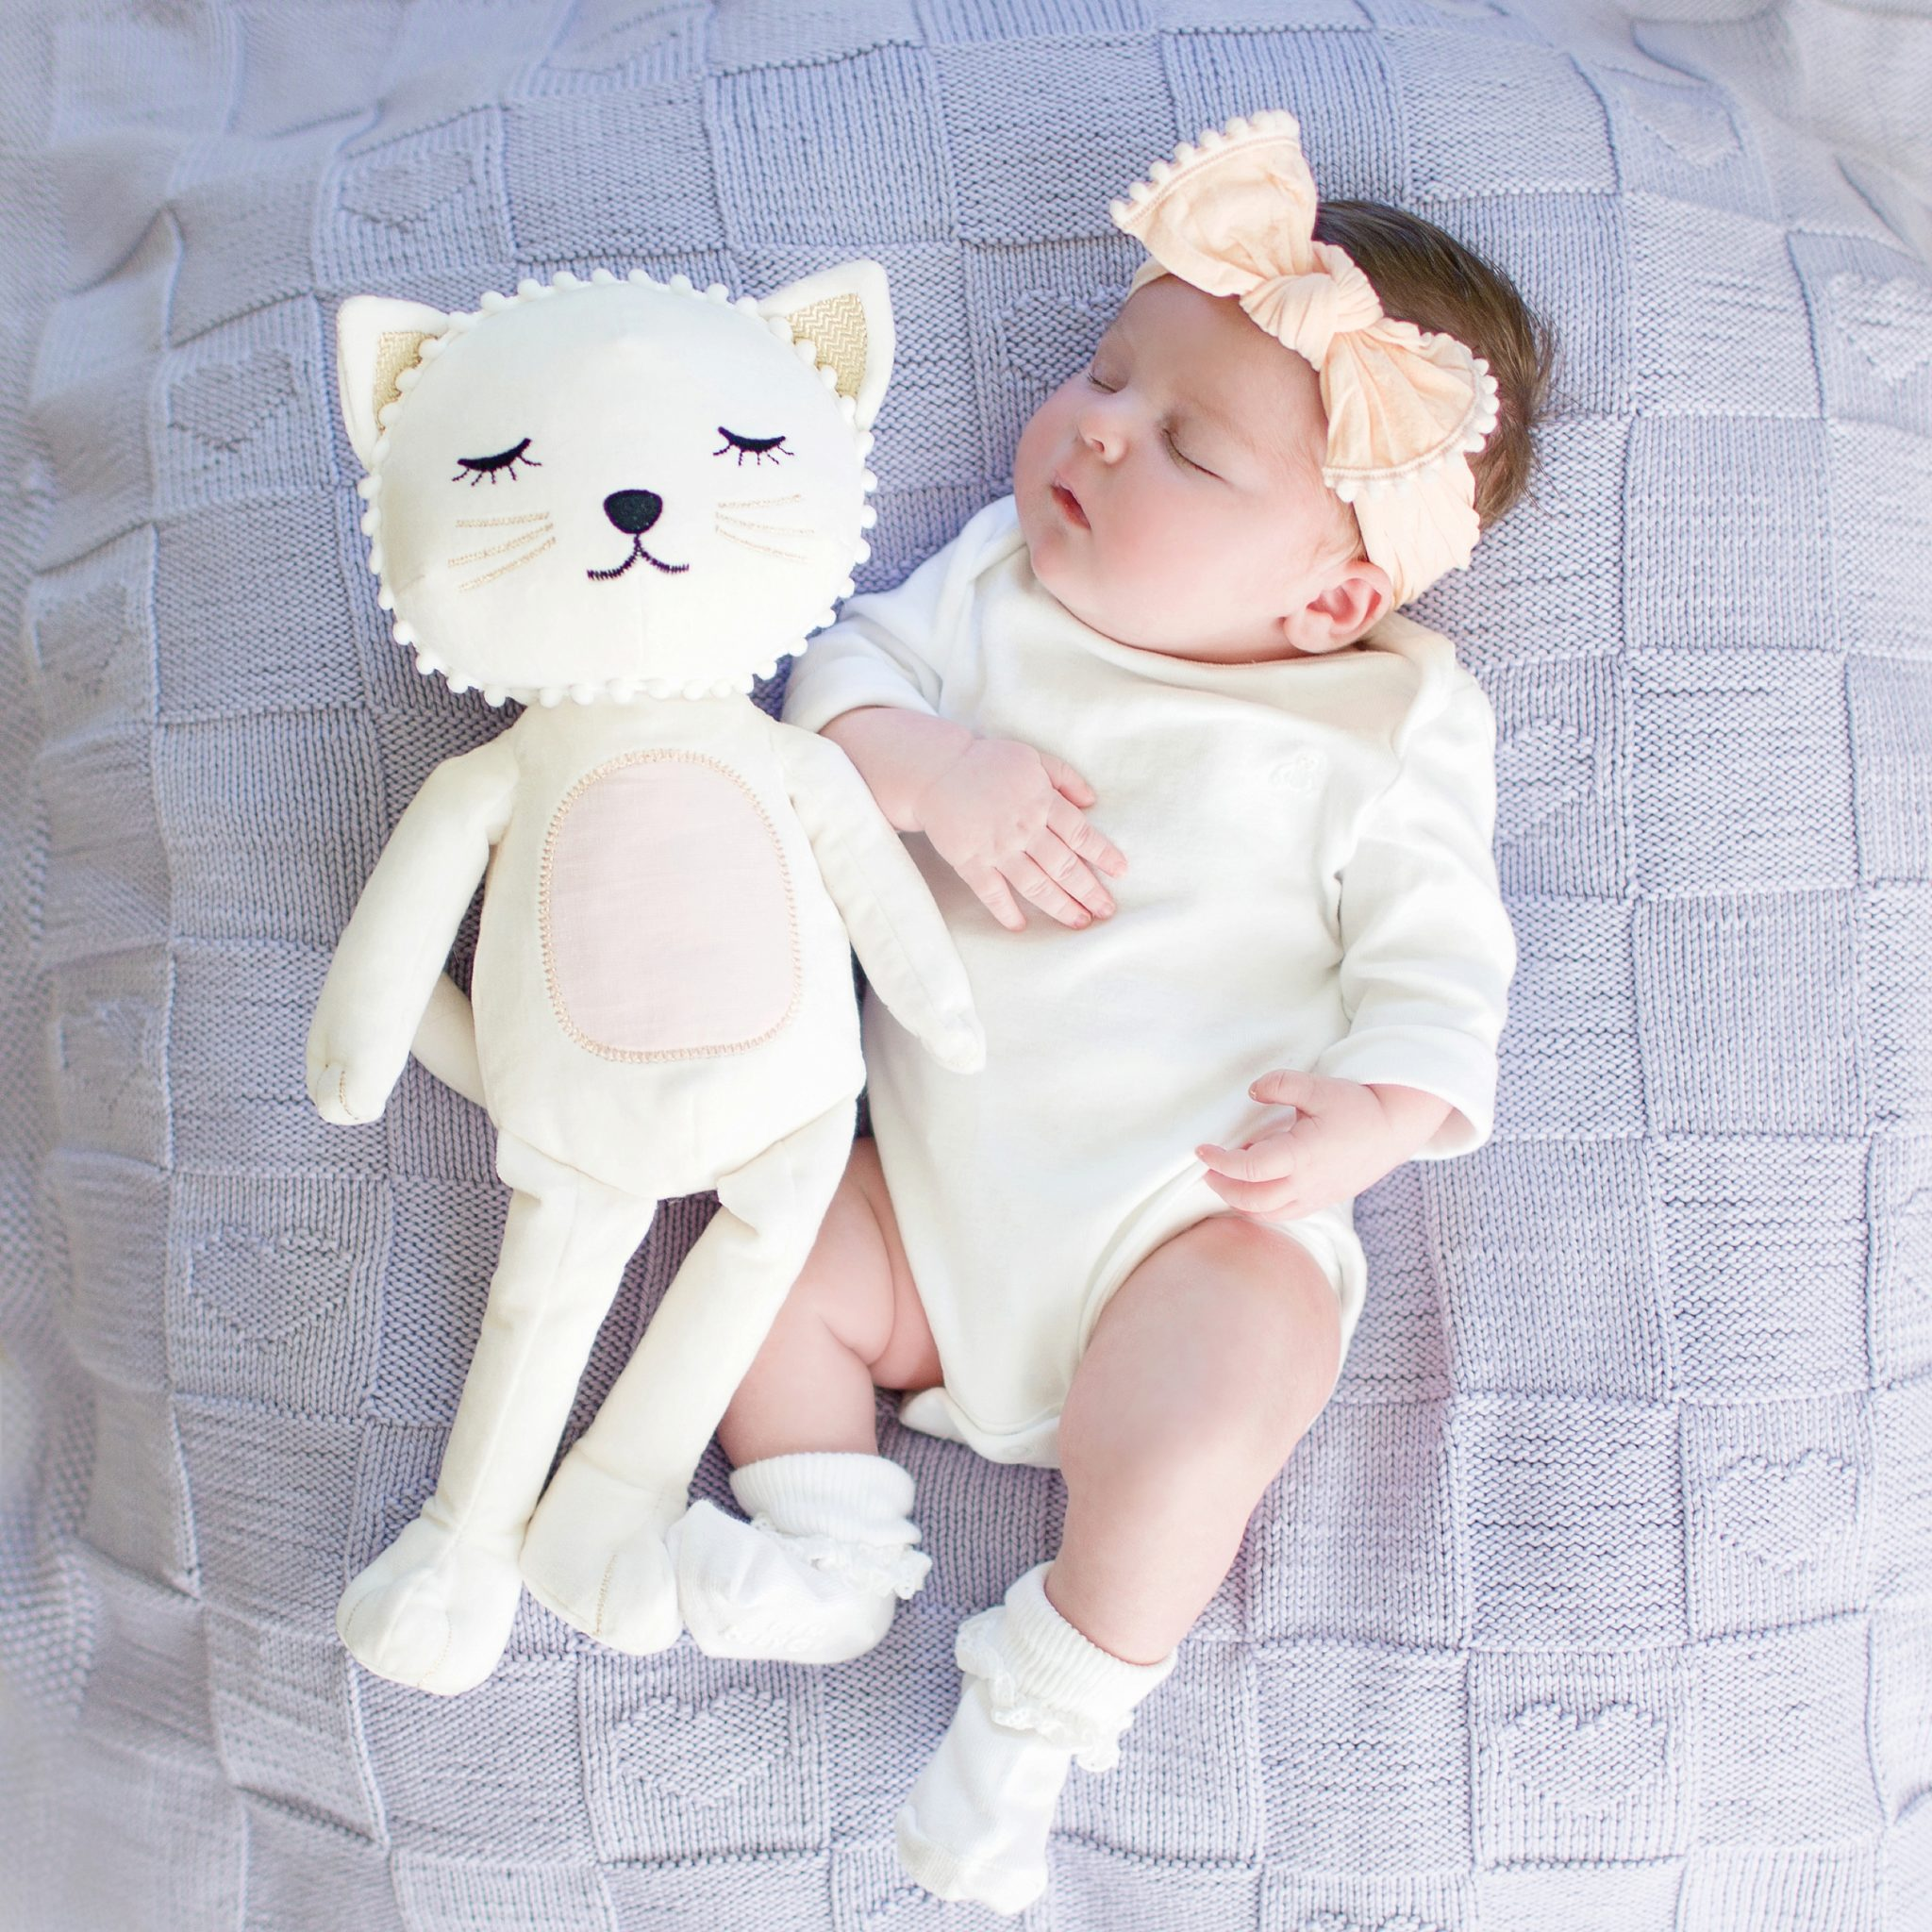 olivia_newborn_3